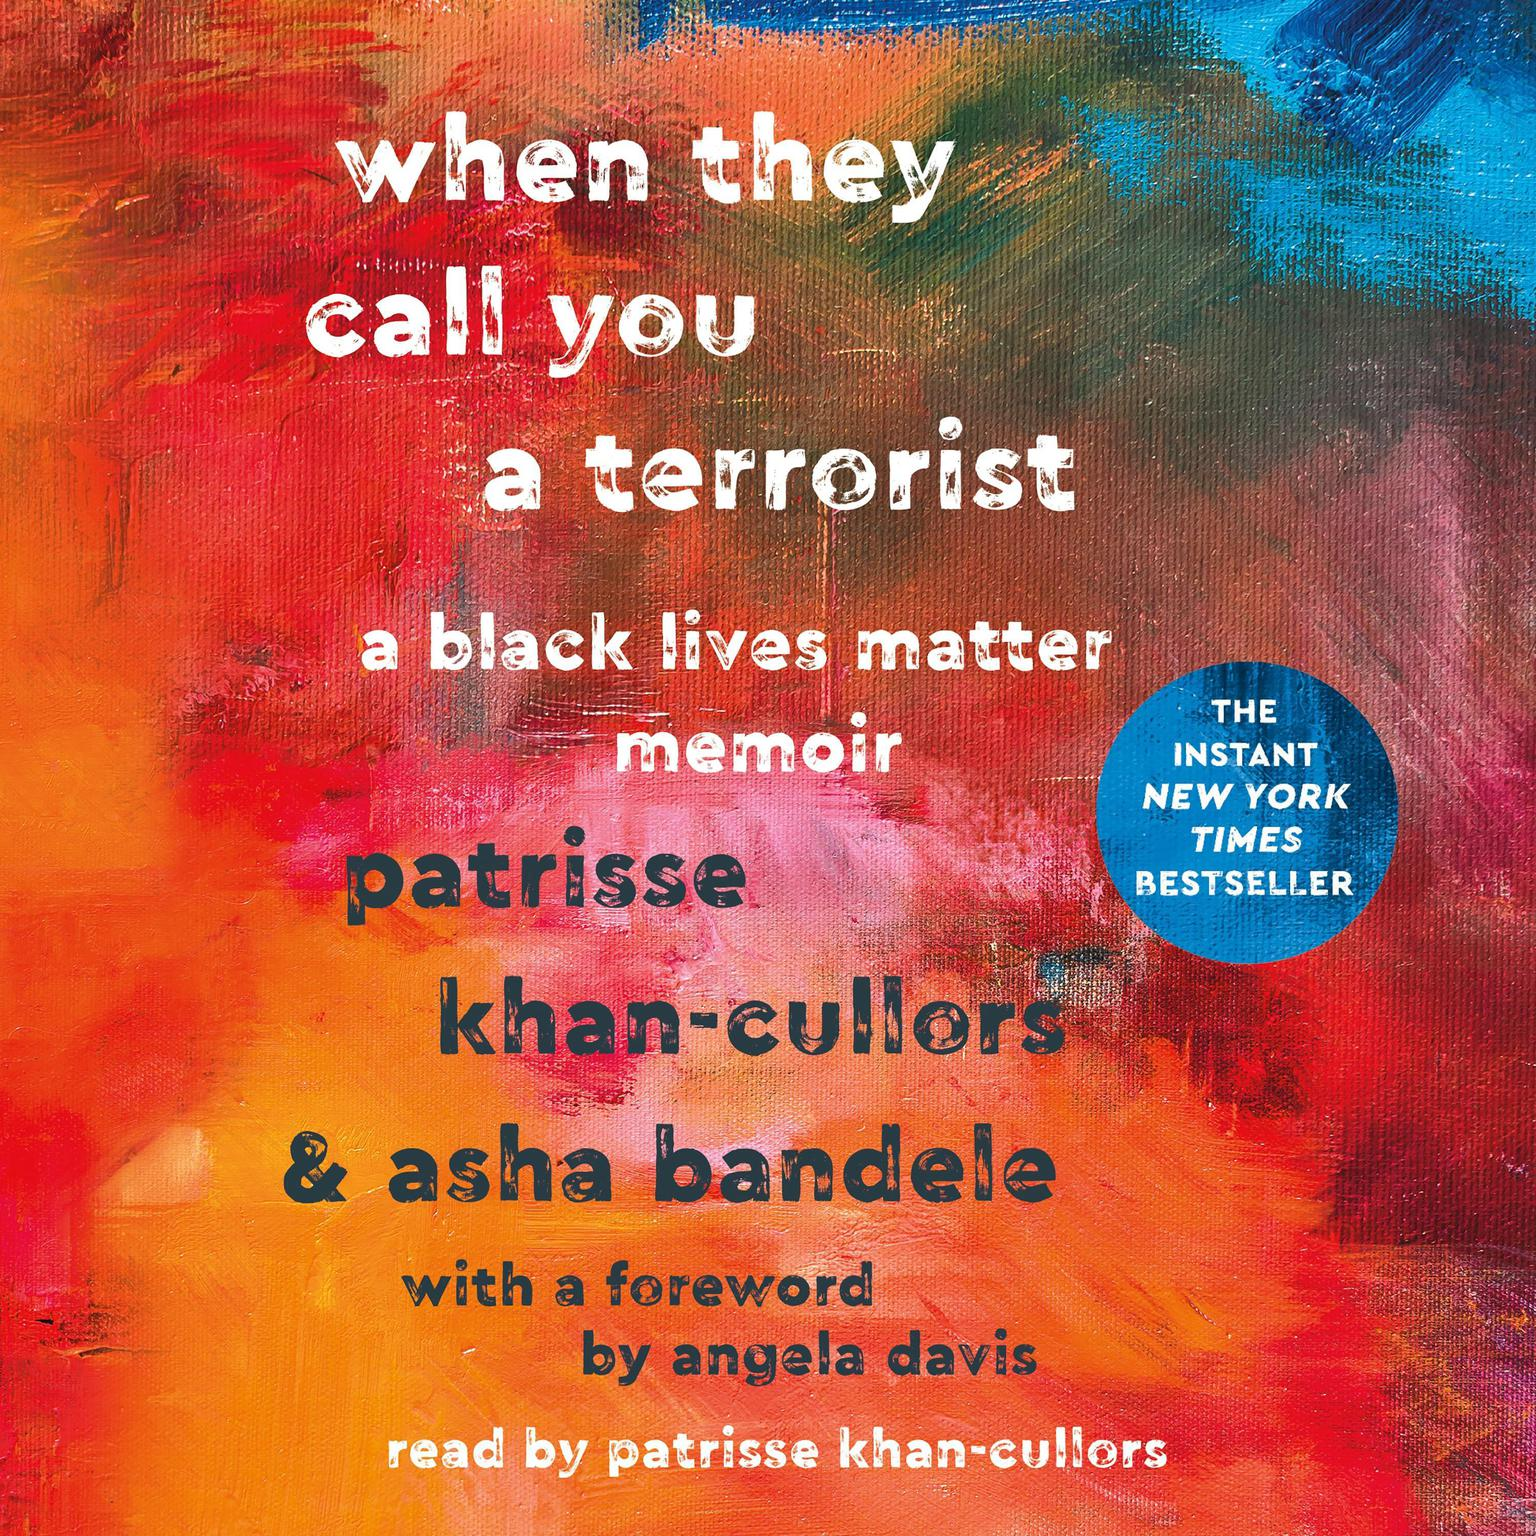 When They Call You a Terrorist: A Black Lives Matter Memoir Audiobook, by Patrisse Khan-Cullors